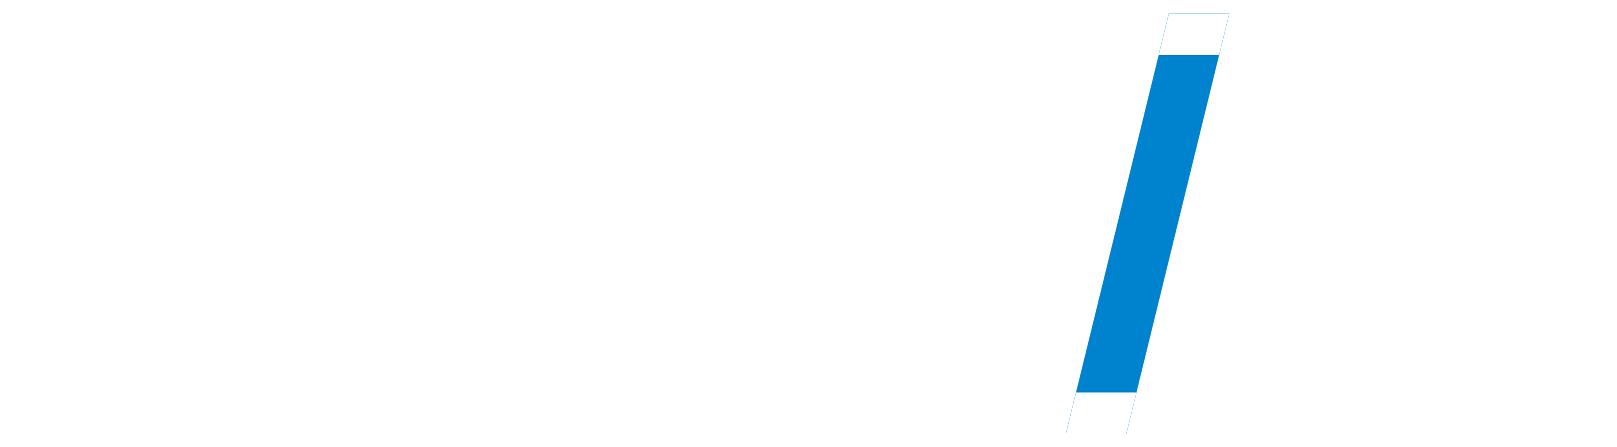 Slashpipe Logo